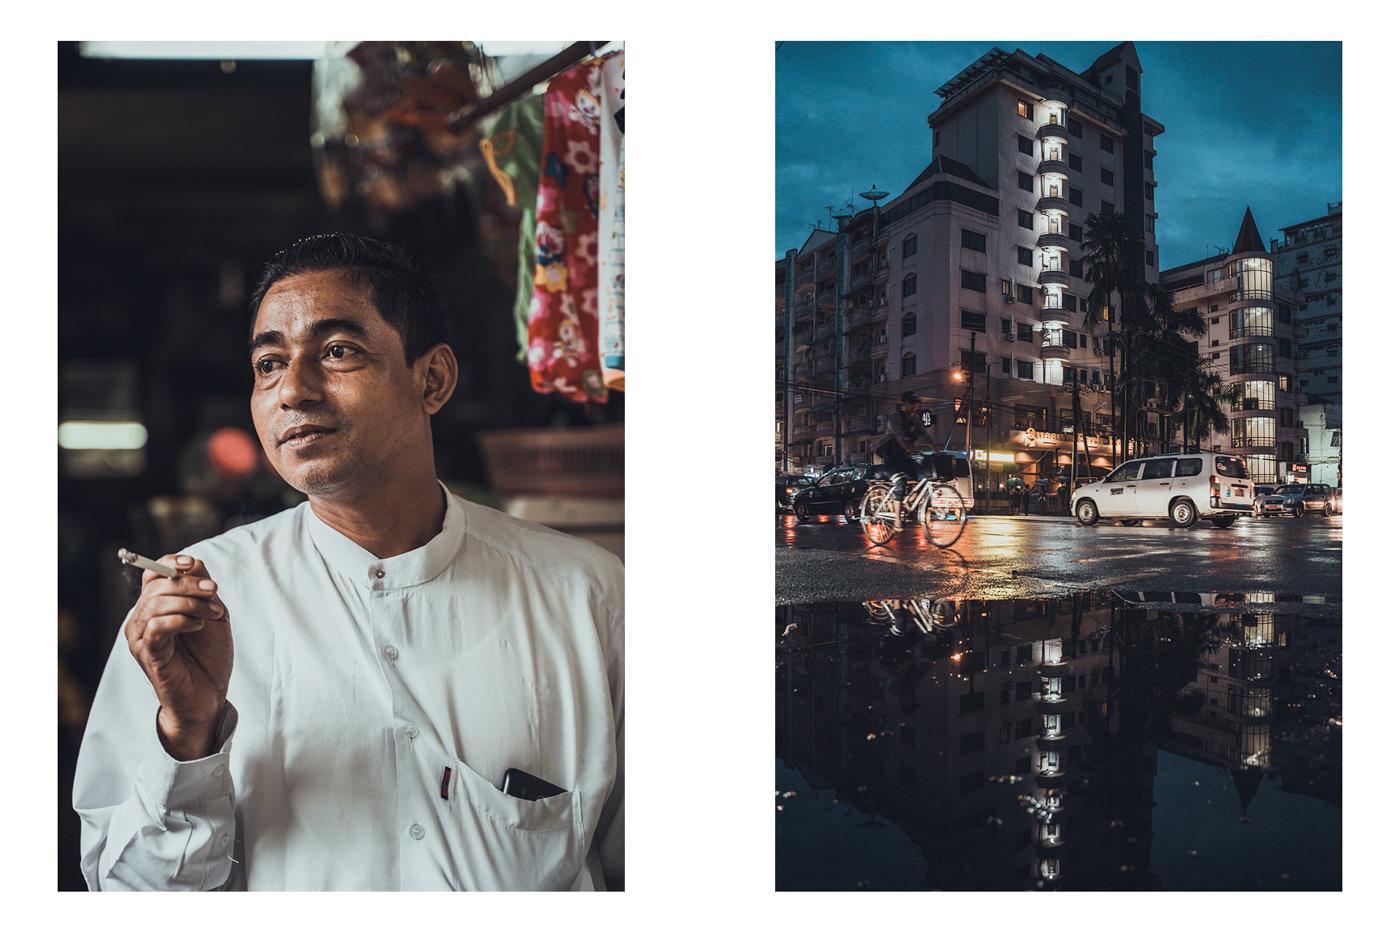 myanmar burma yangon bagan inlelake portrait Landscape people cinematic magazine